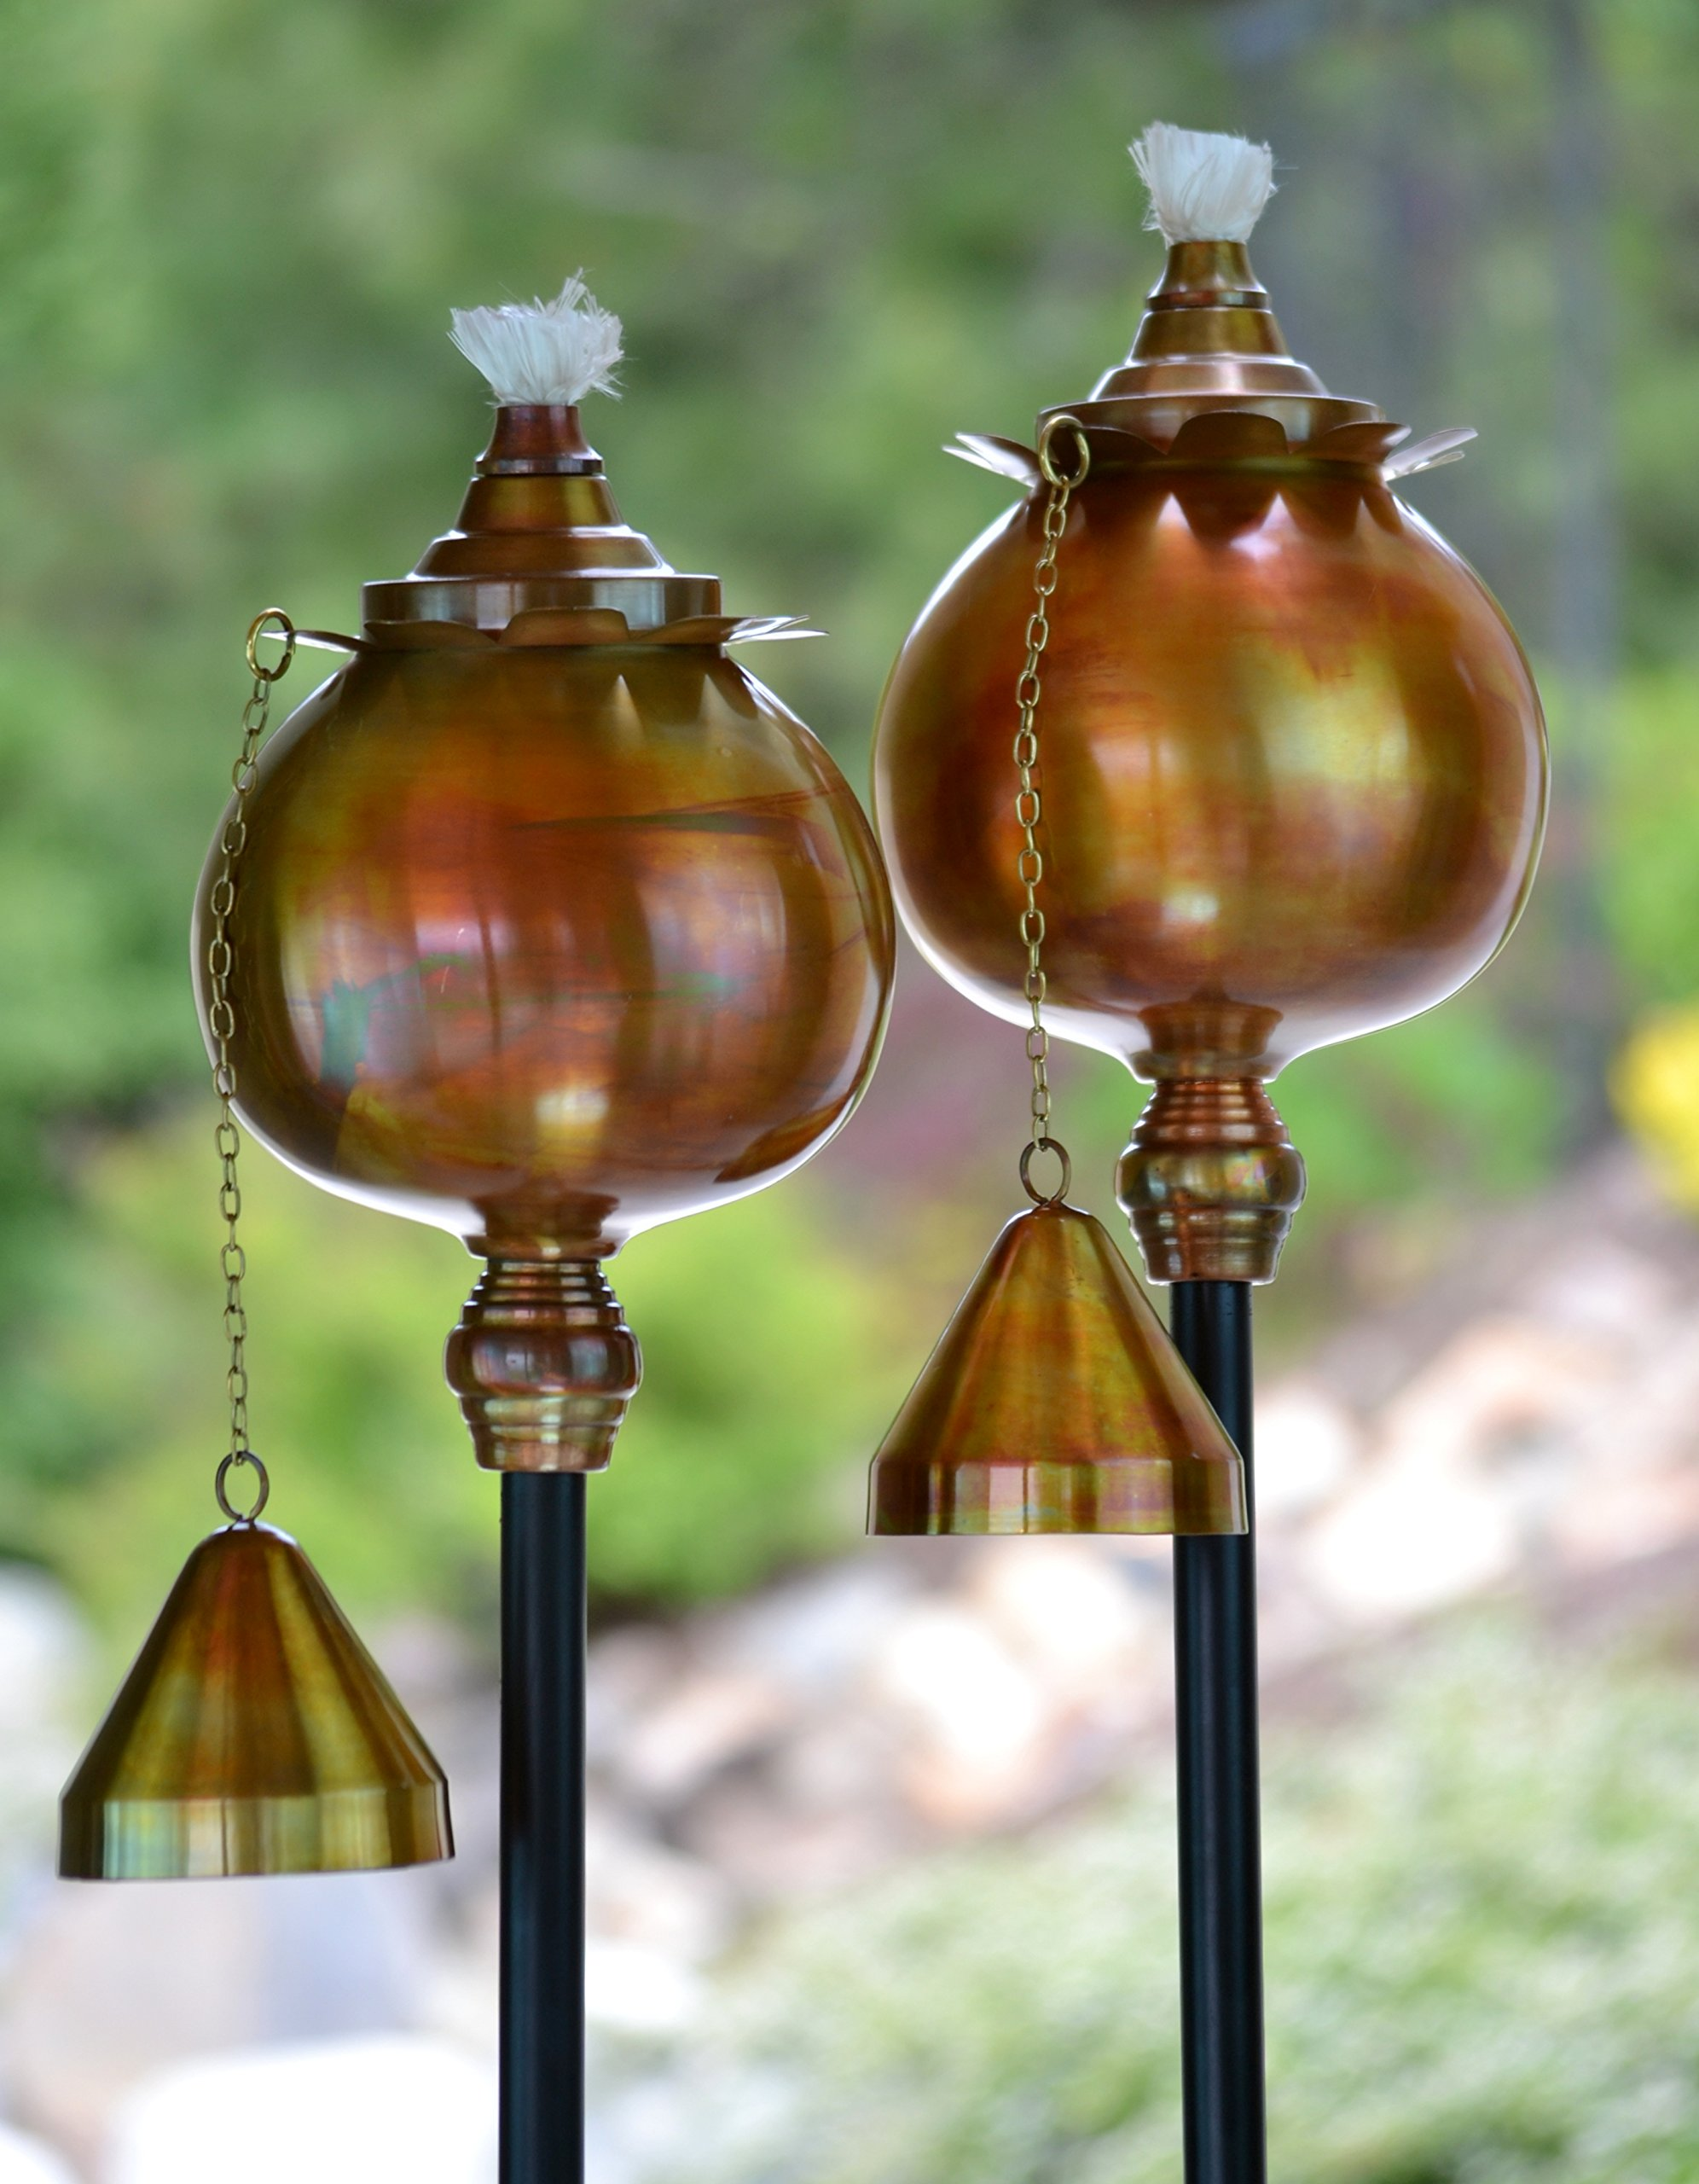 H Potter Copper Rustic Patio Deck 591 Set Garden Torch (2, Rustic) by H Potter